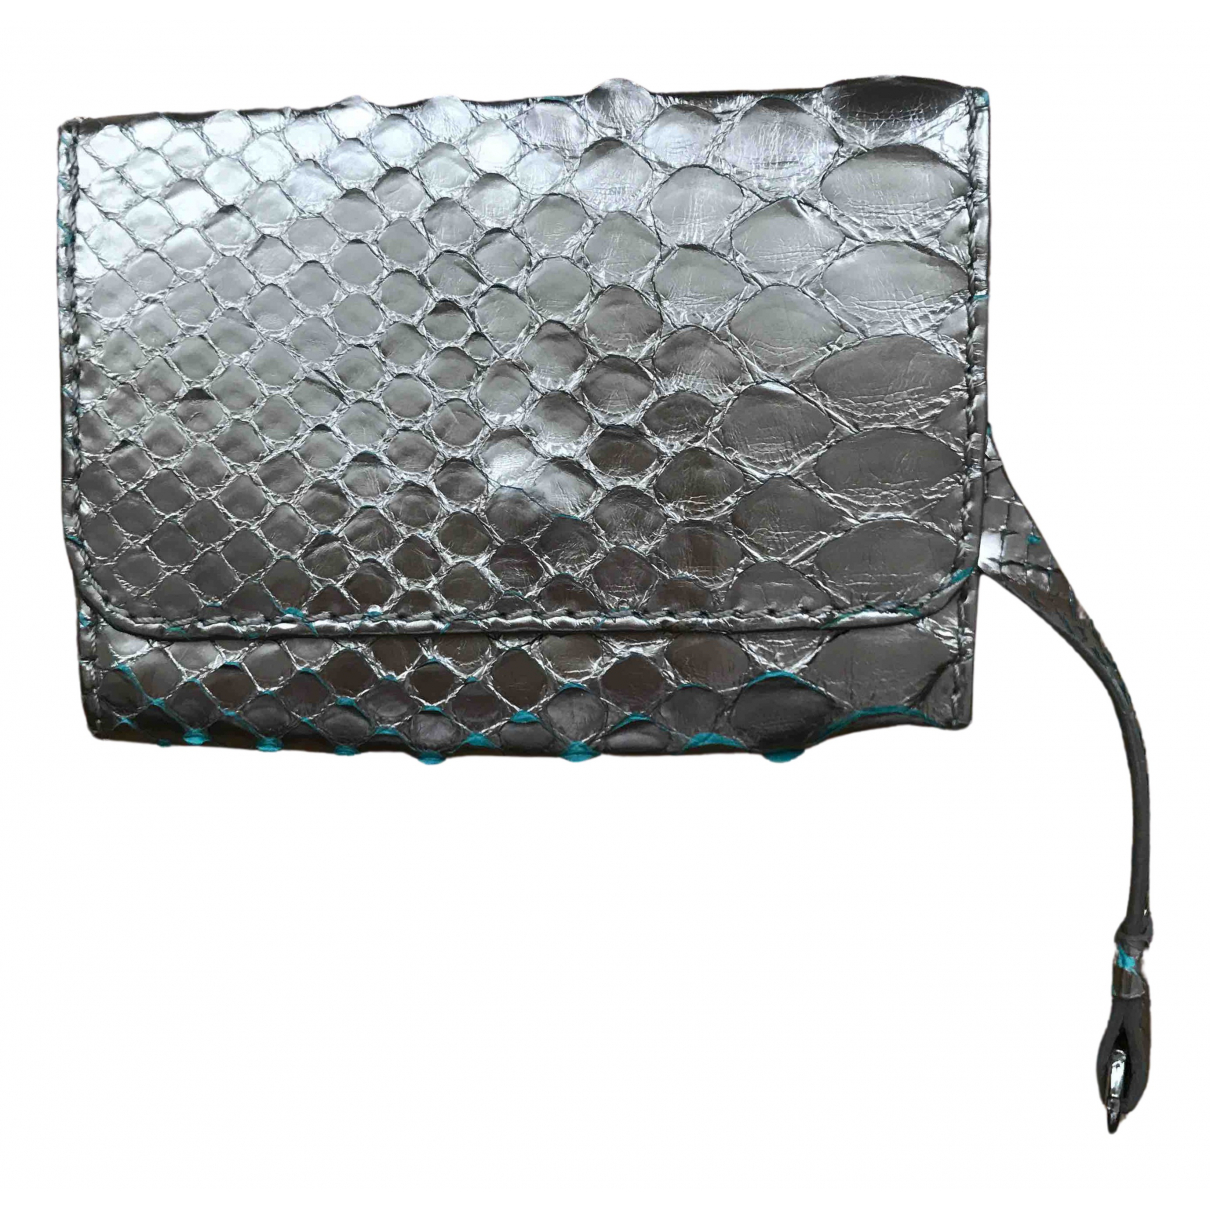 Chloé N Metallic Python wallet for Women N